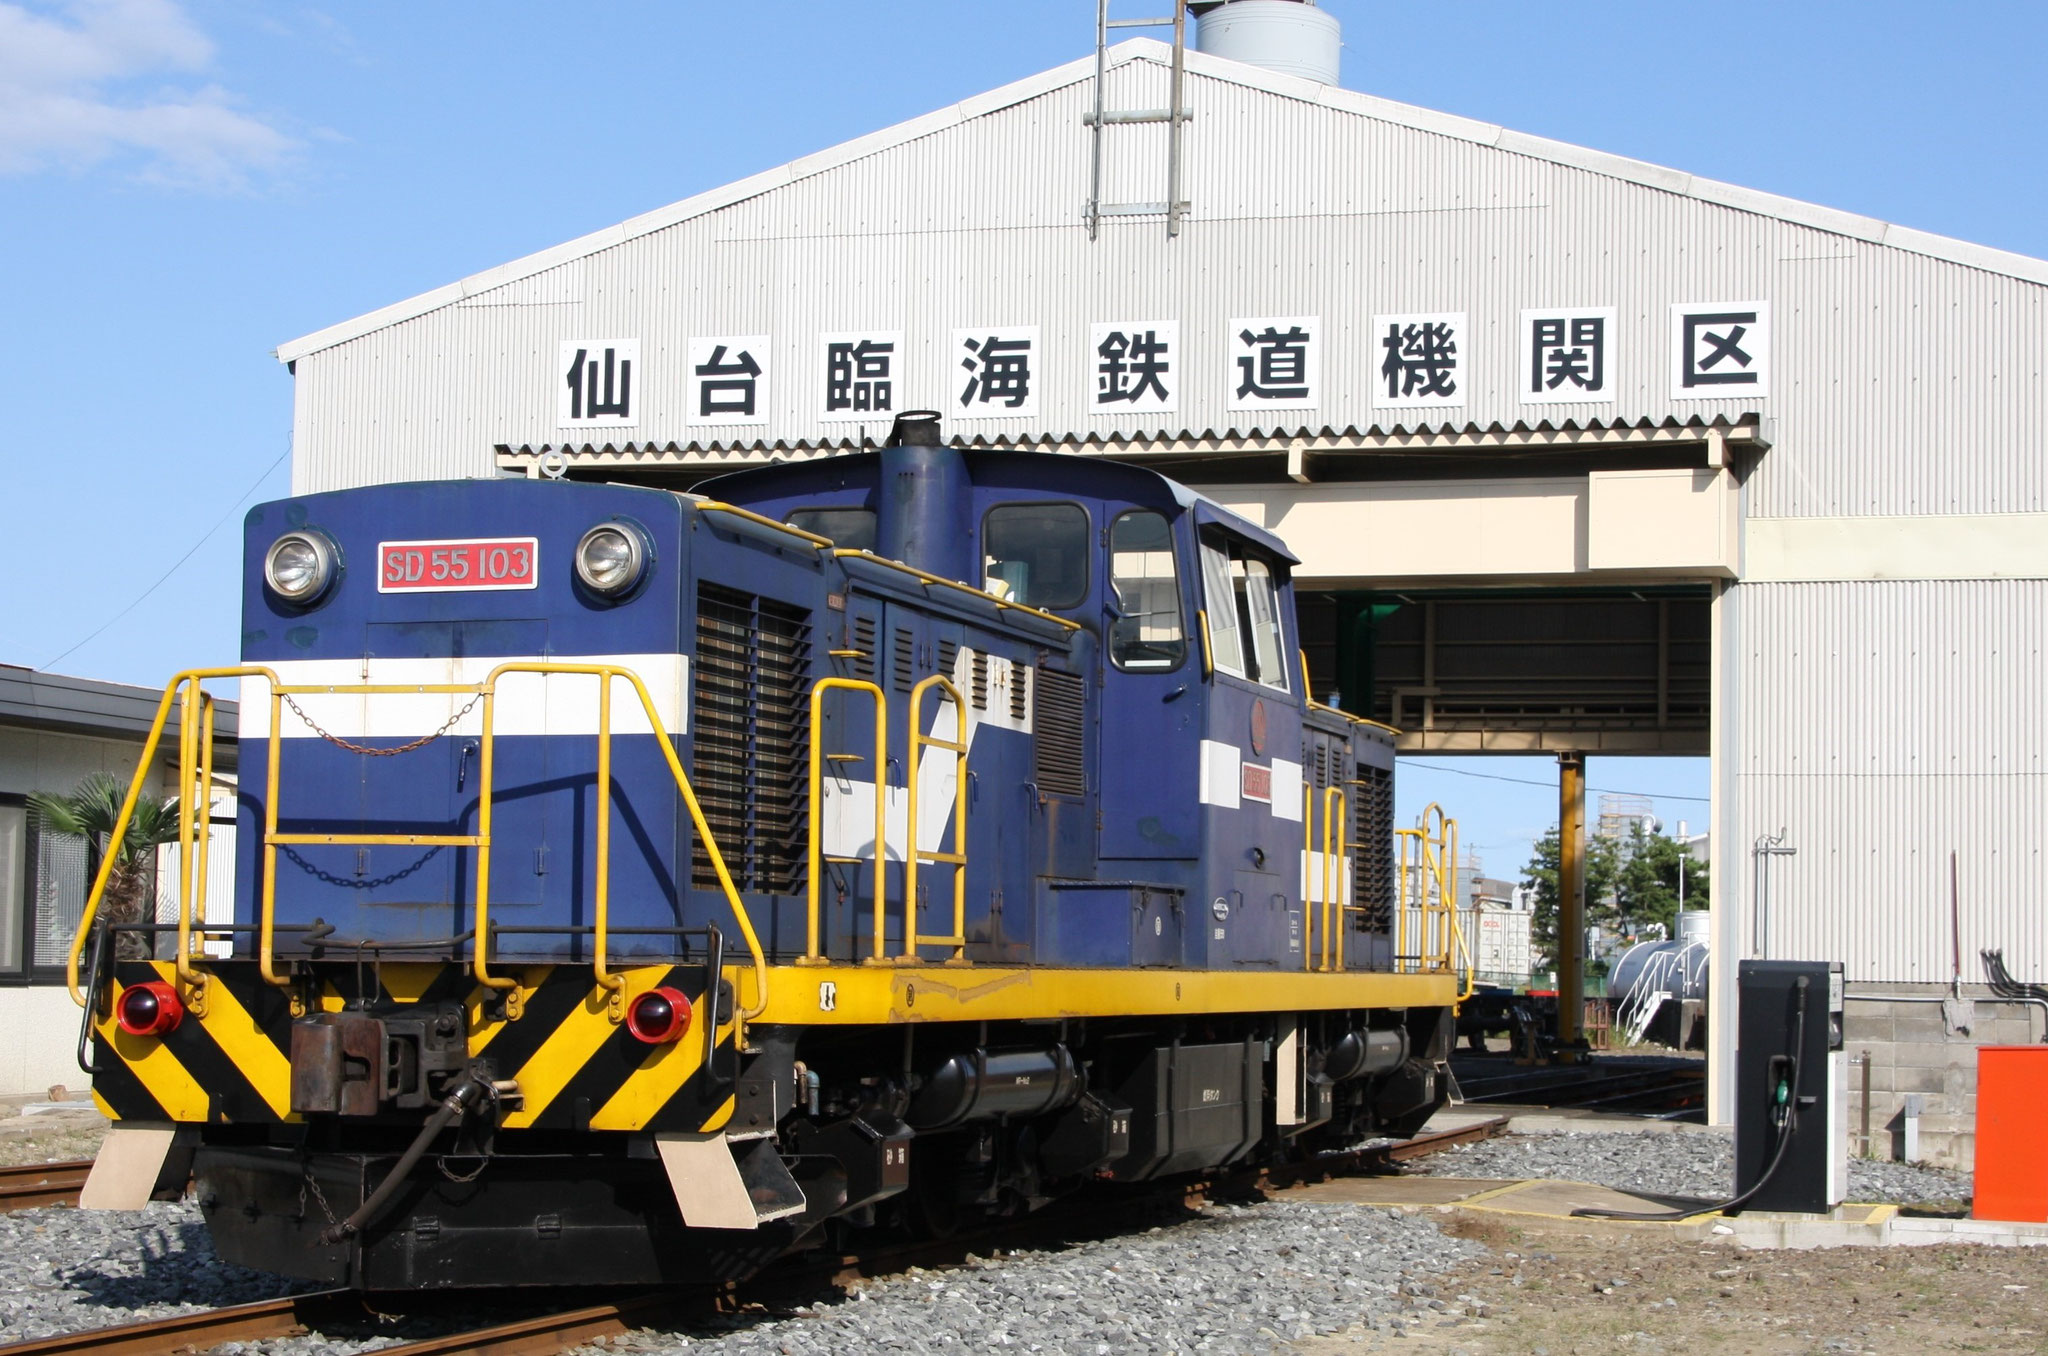 Sendai Rinkai Railway